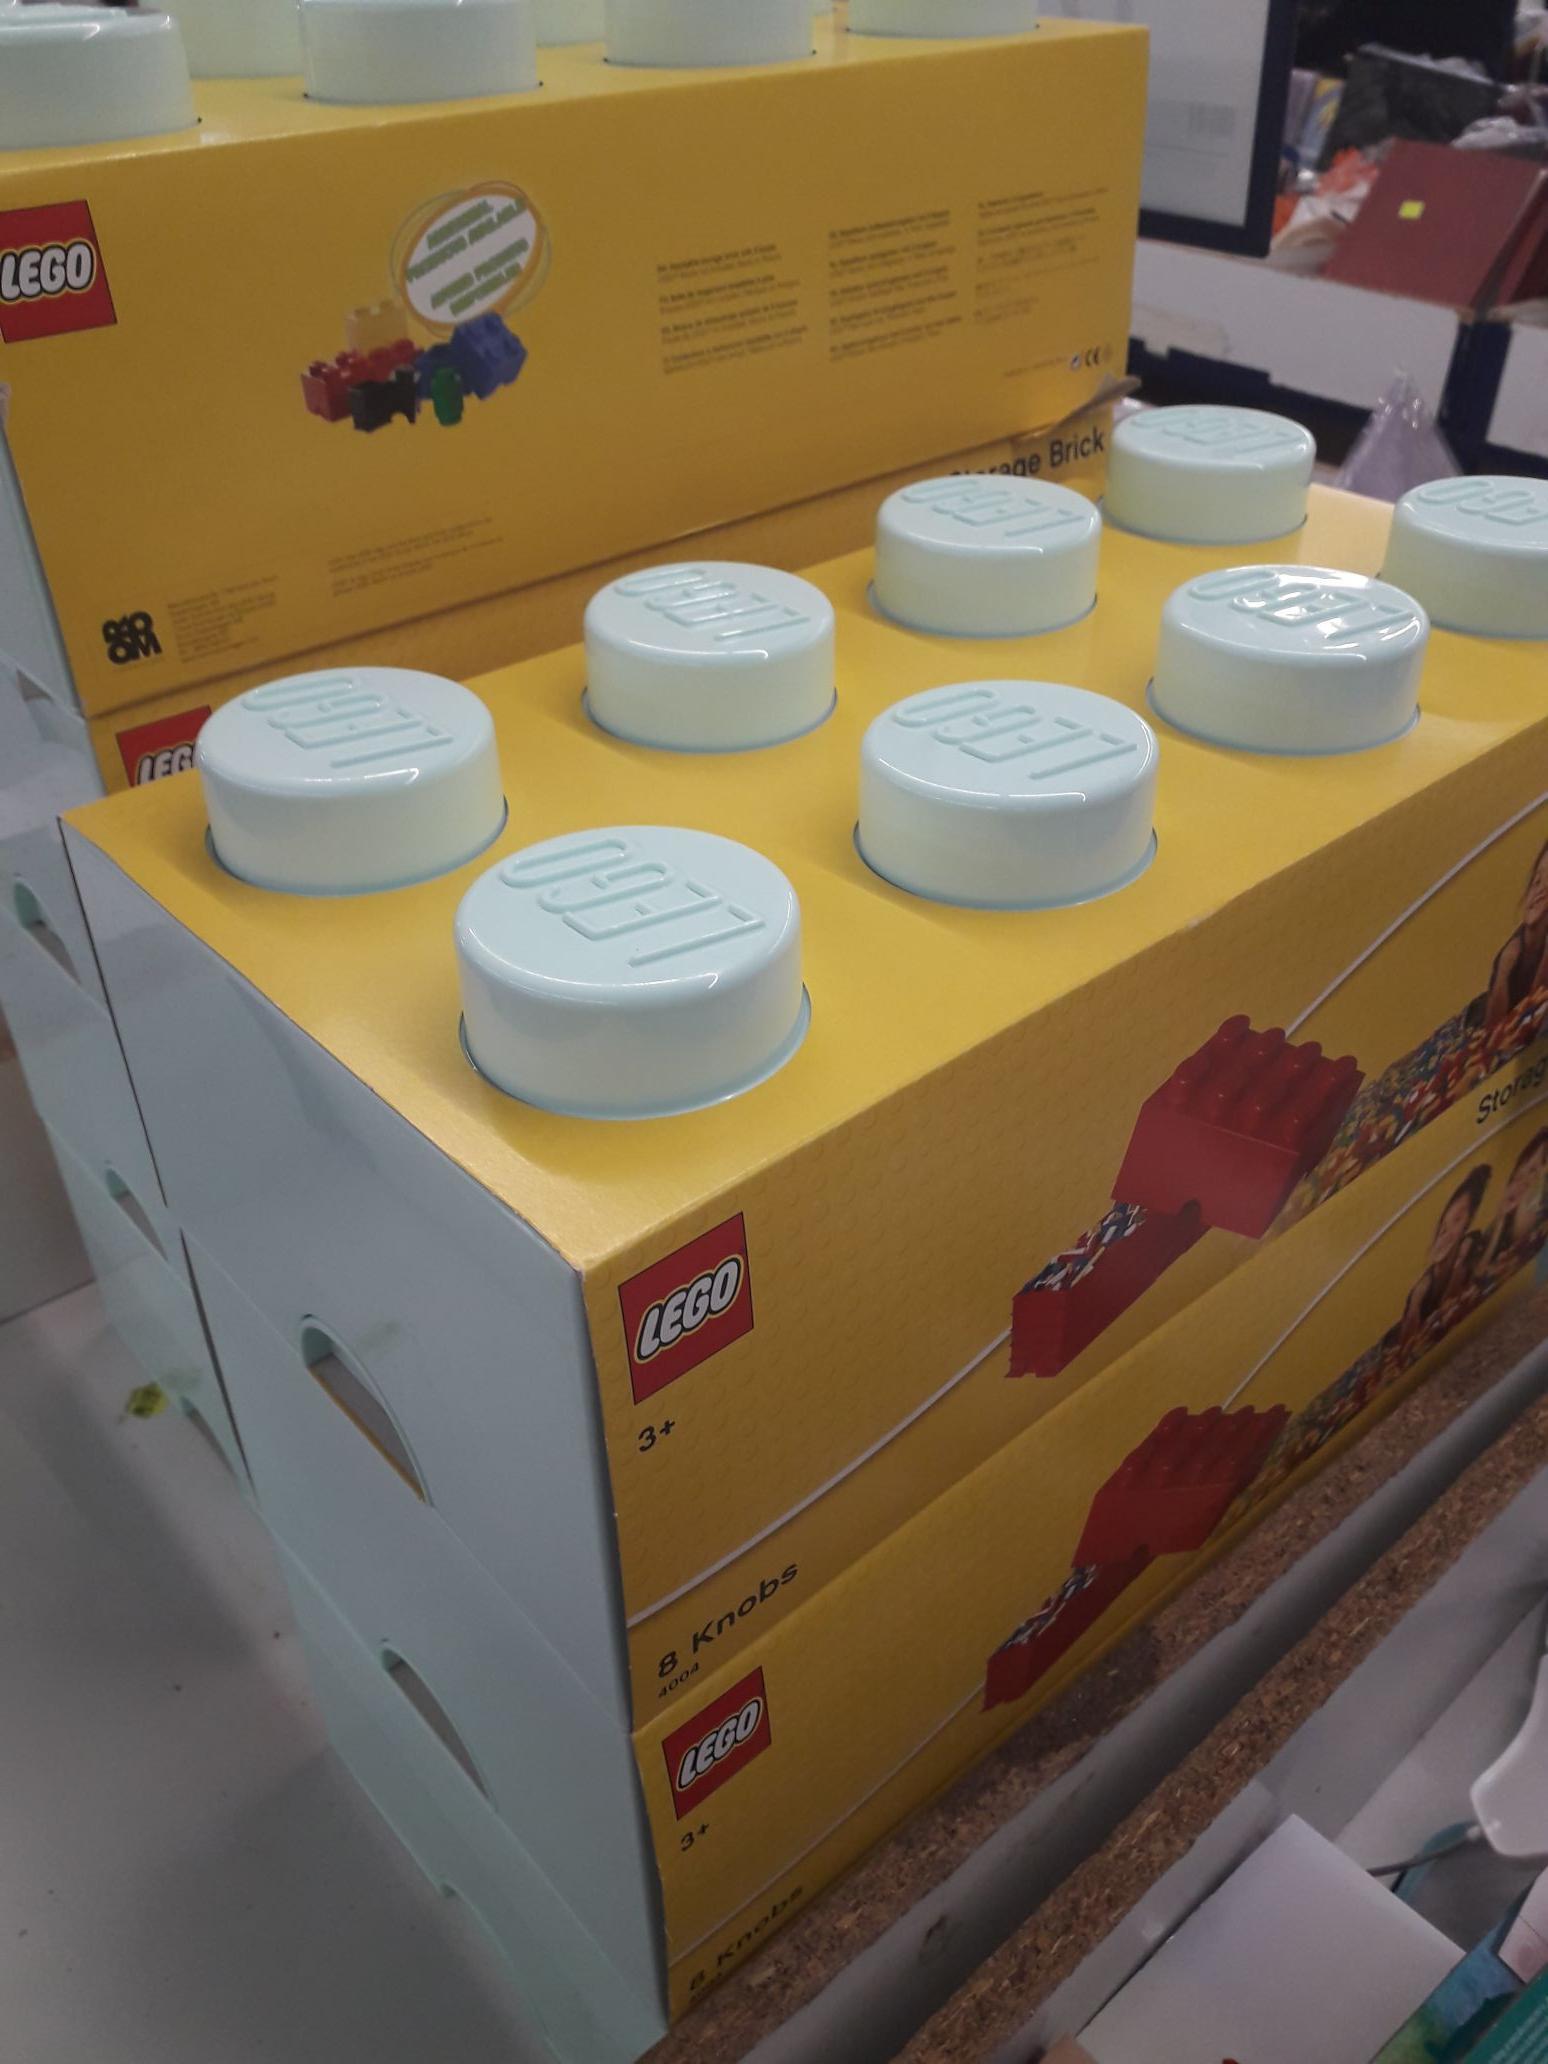 Maxi Boite rangement Lego (Rennes 35)